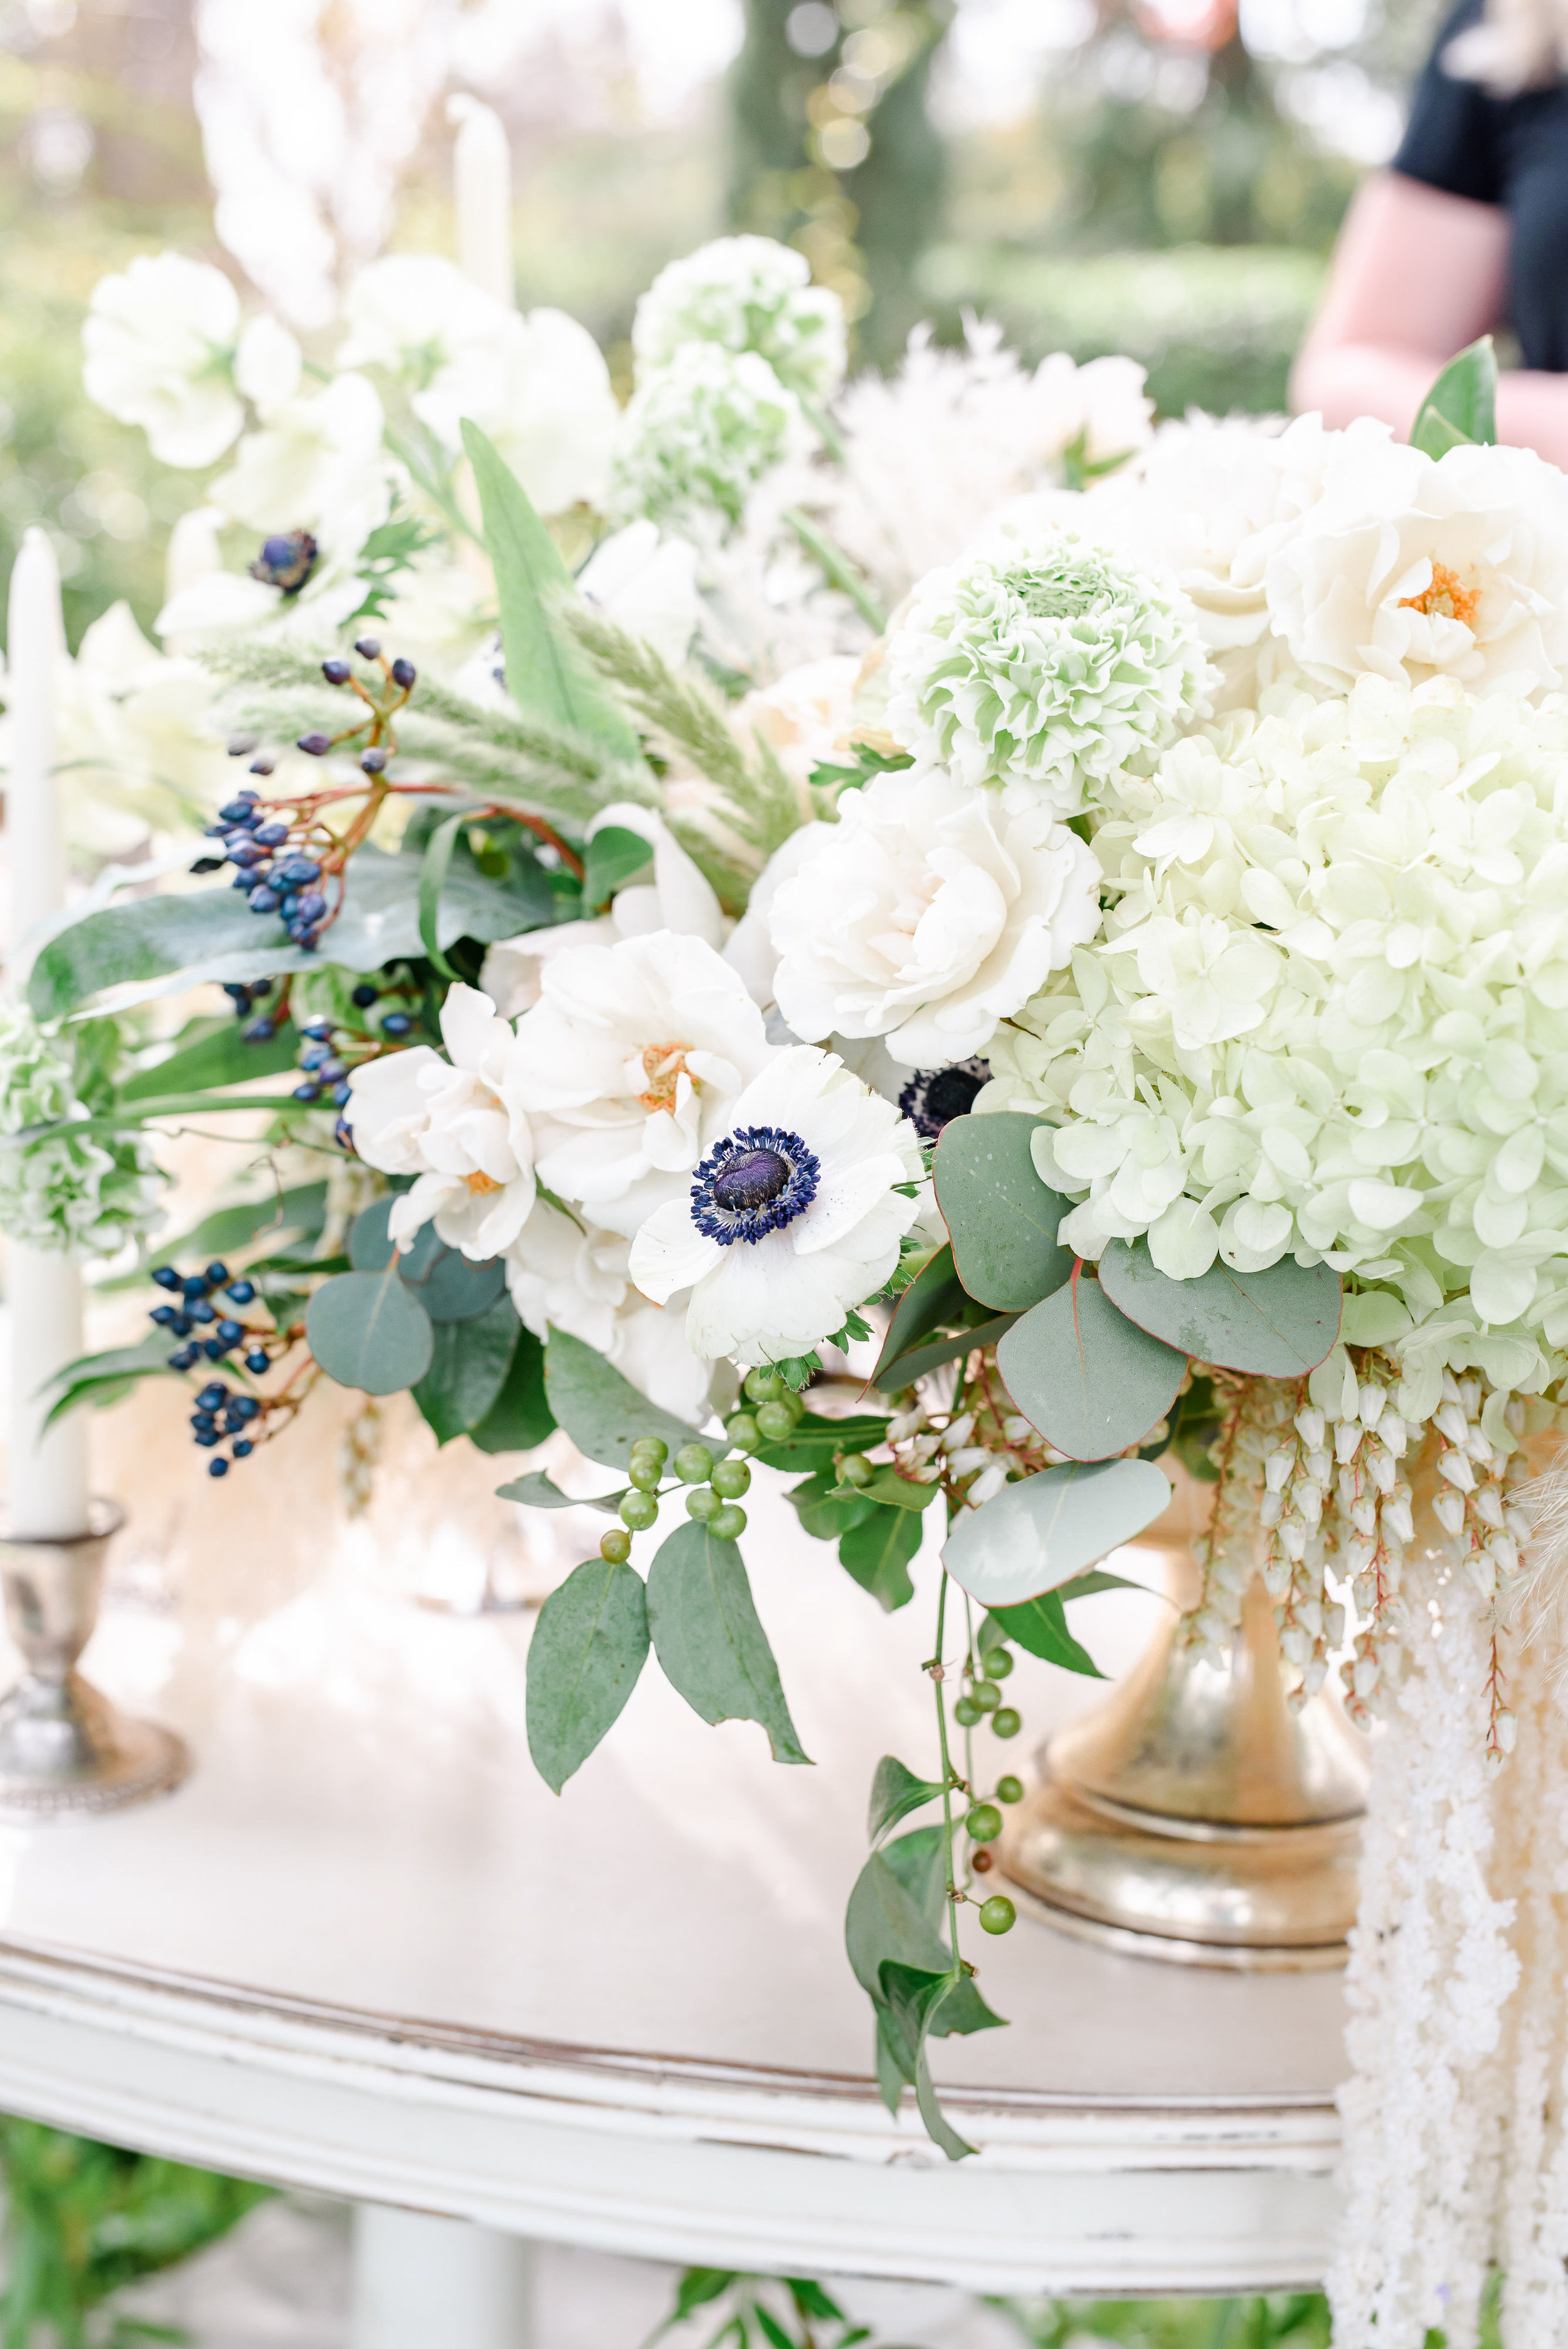 Neutral Wedding Flowers | Pop of Blue | Anemones